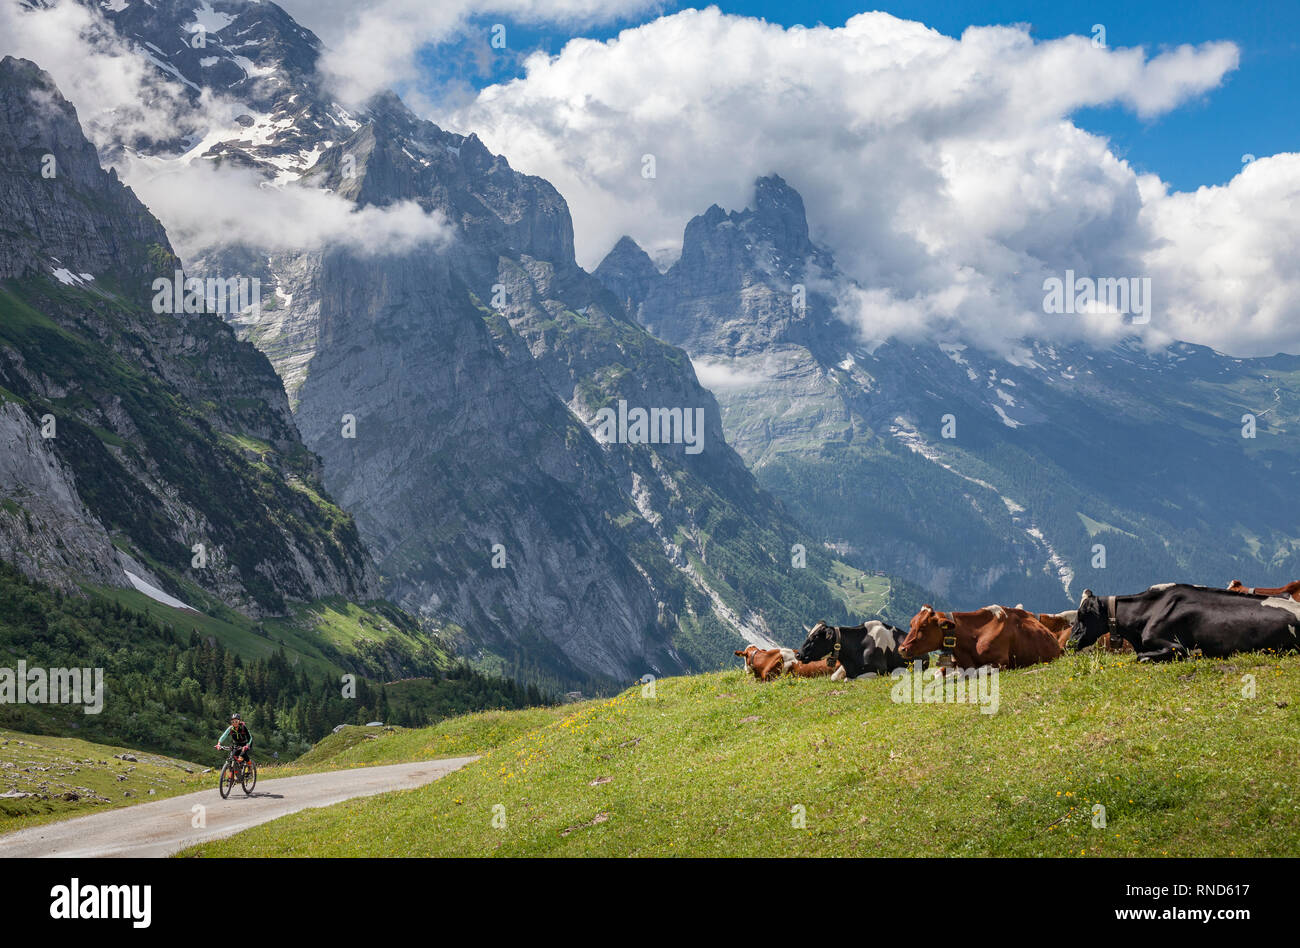 cattle herd in the grasslands high above Grindelwald with Eiger North face in the background, Berner Oberland,Jungfrauregion, Switzerland - Stock Image